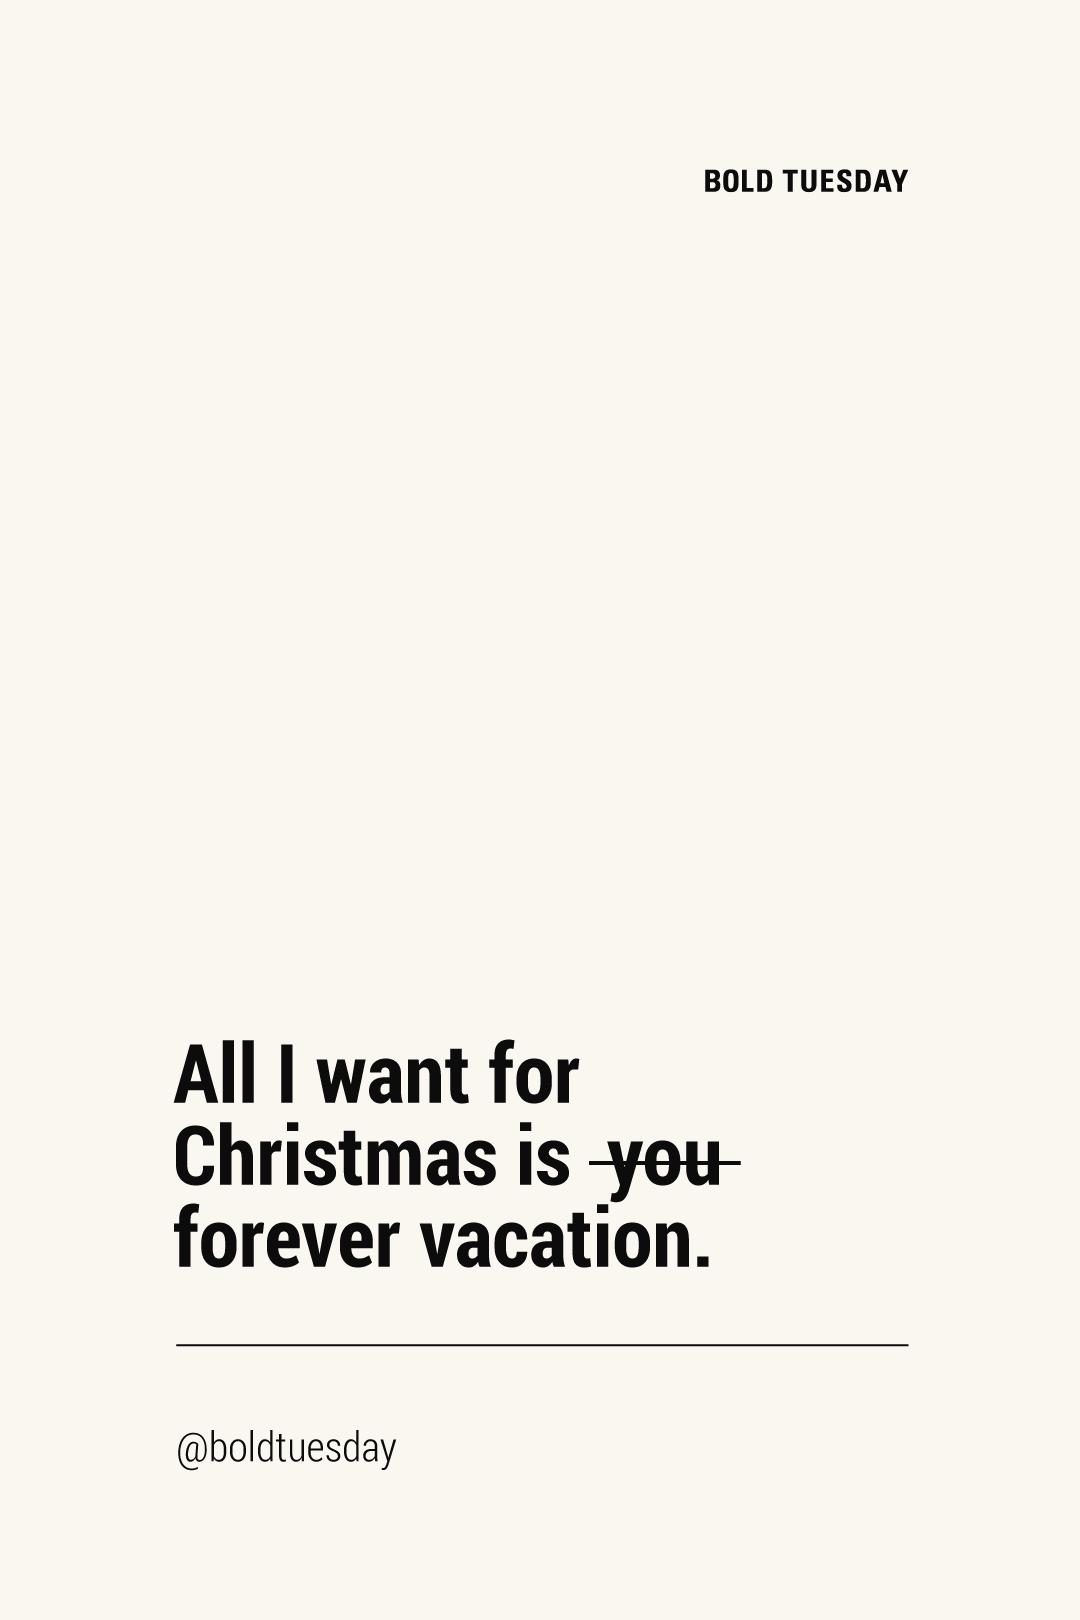 100 Original Travel Quotes That Make You Laugh Travel Quotes Vacation Quotes Funny Quotes